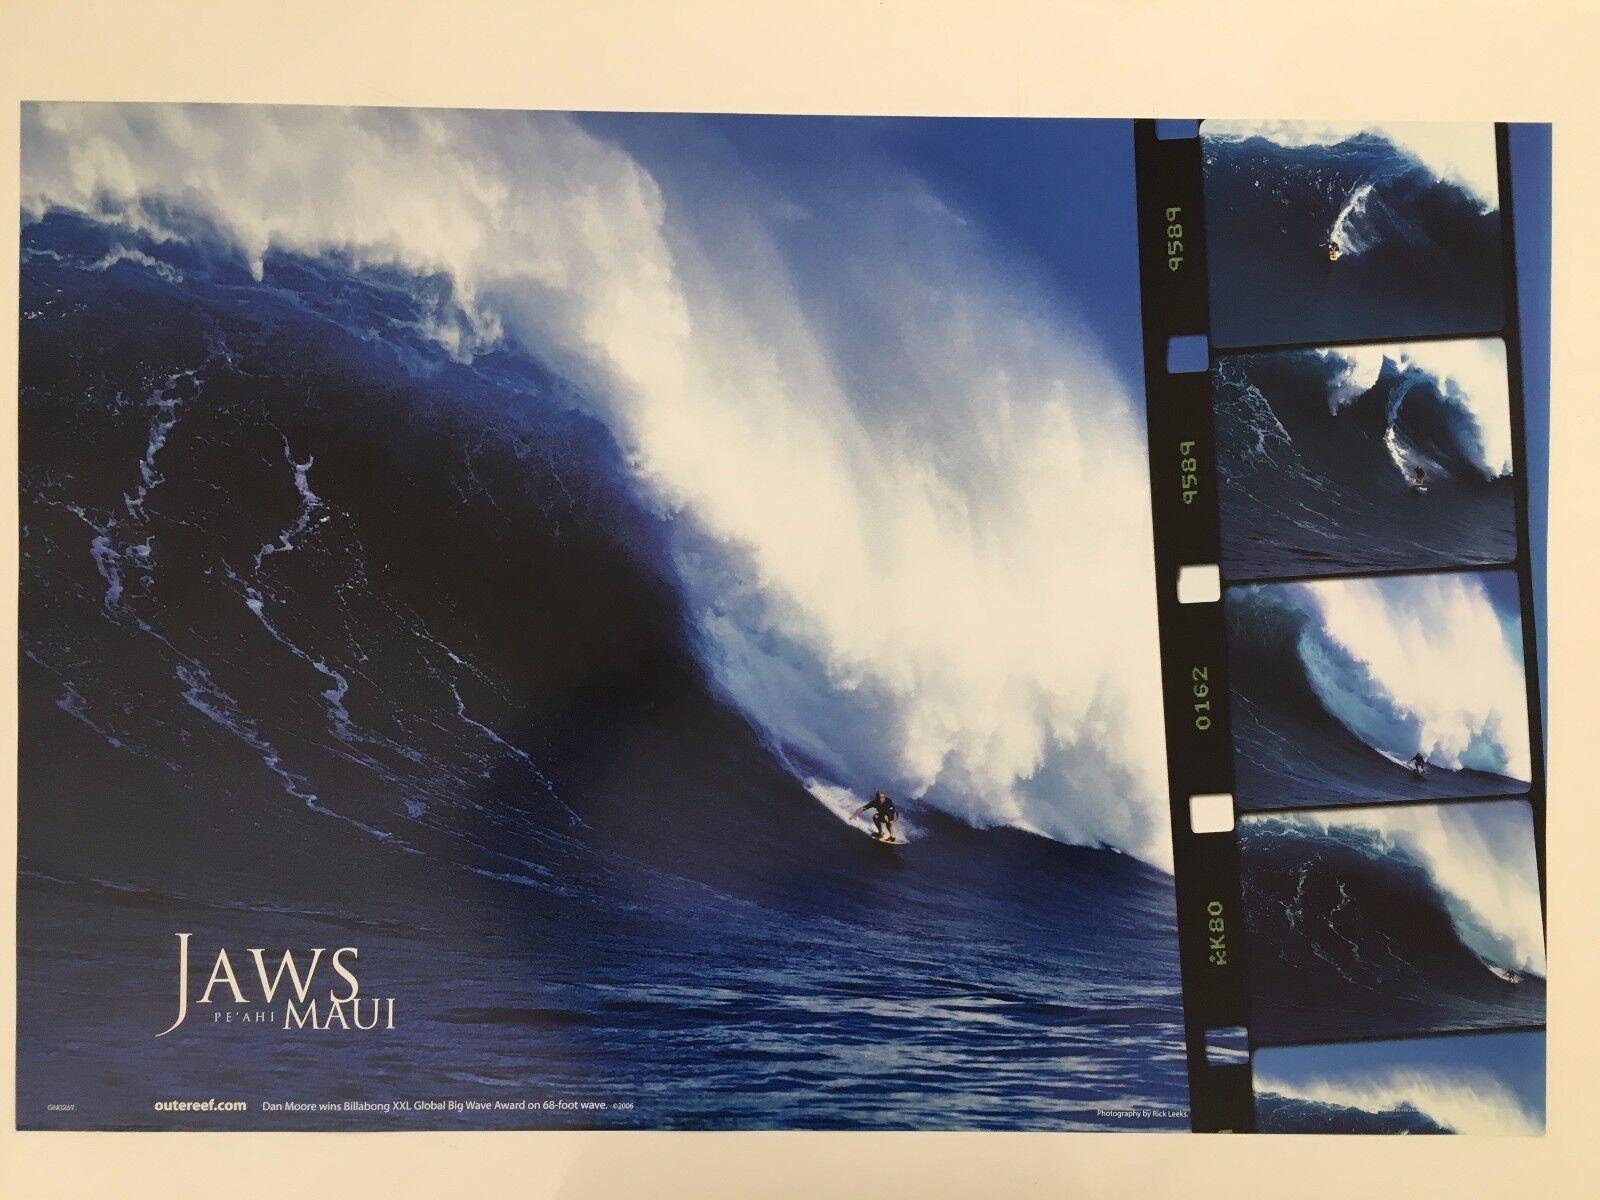 Dan Moore gana Billabong XXL global Big Wave, Maui, surf, con licencia 2006 Cochetel